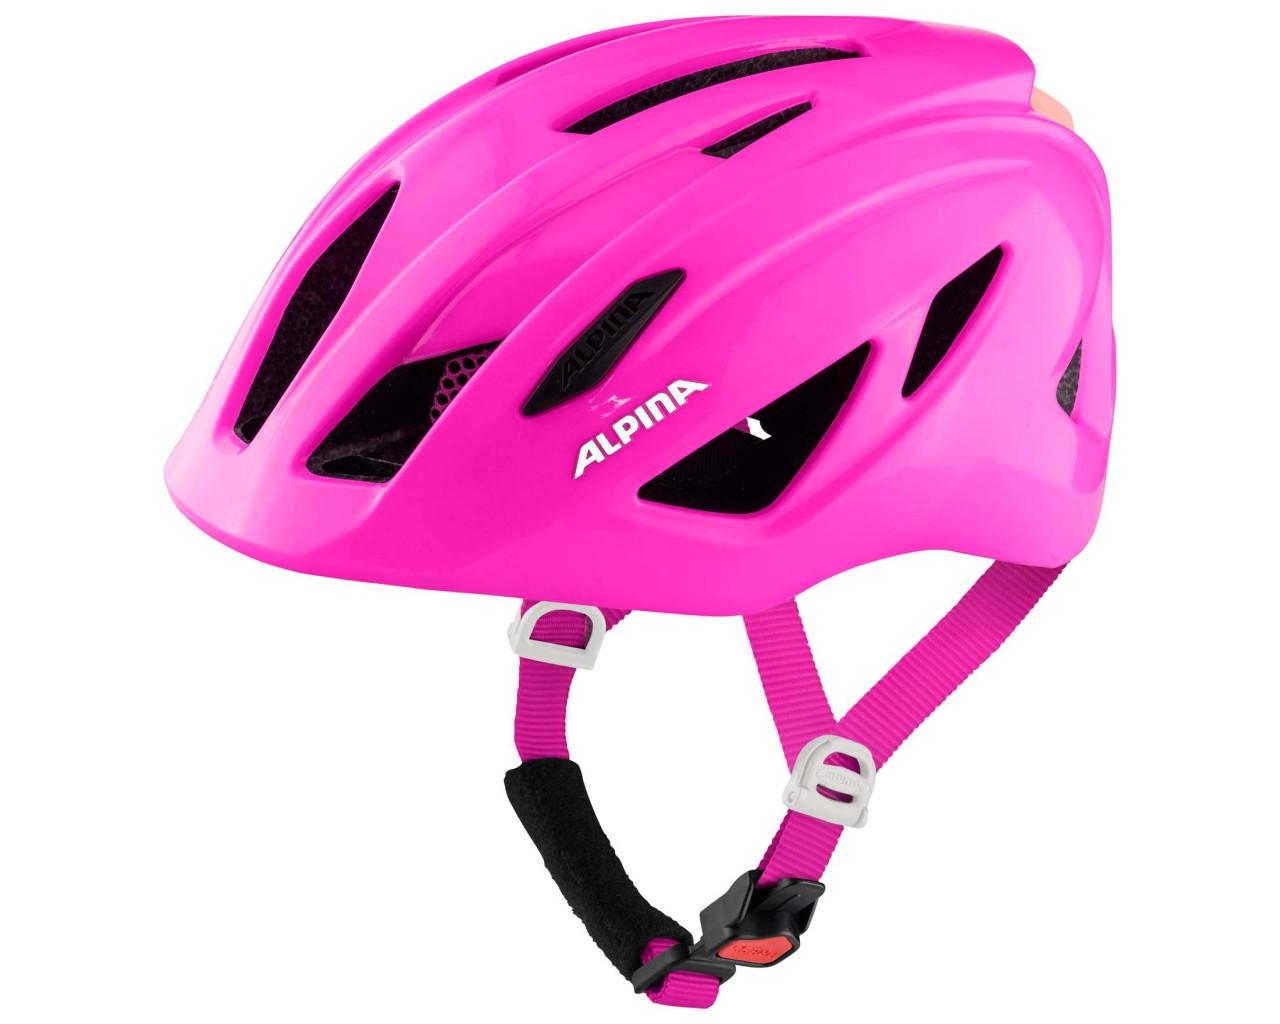 Alpina Pico Flash Kids Bike Helmet | pink gloss 50-55